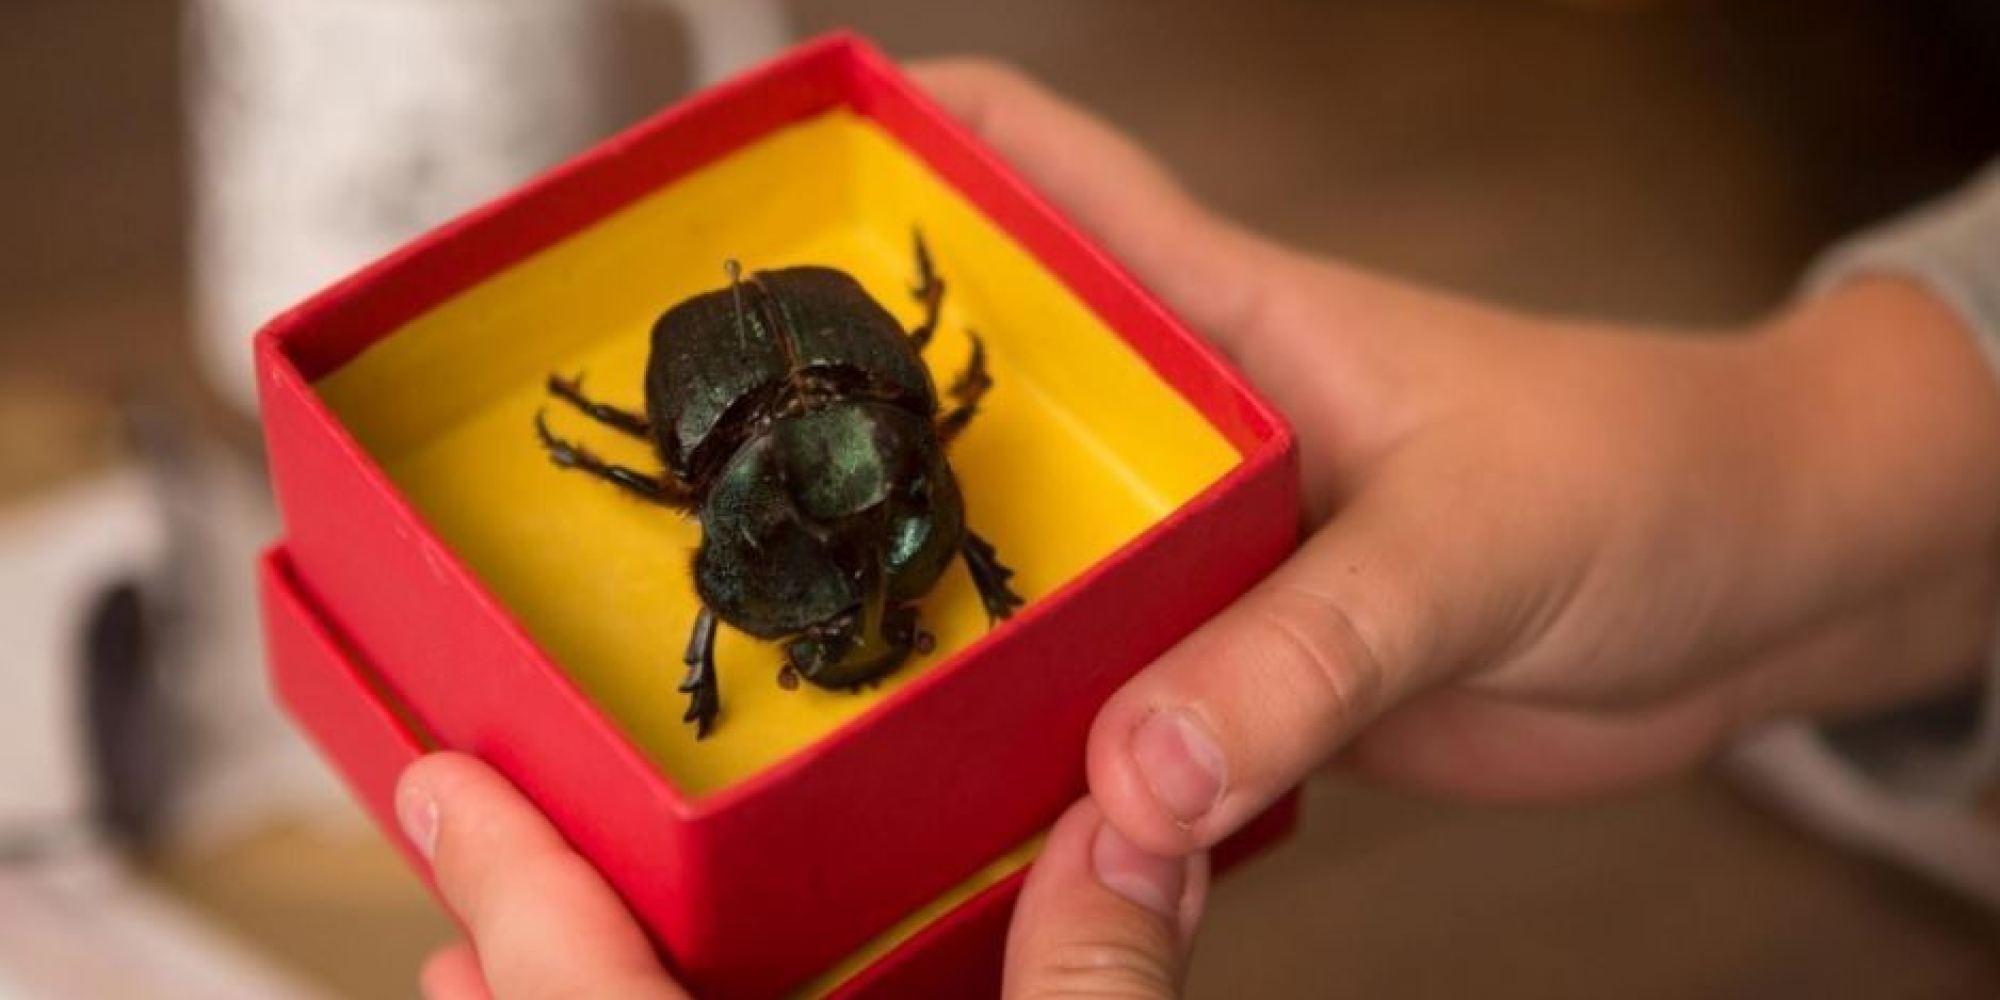 escaravelho do diabo